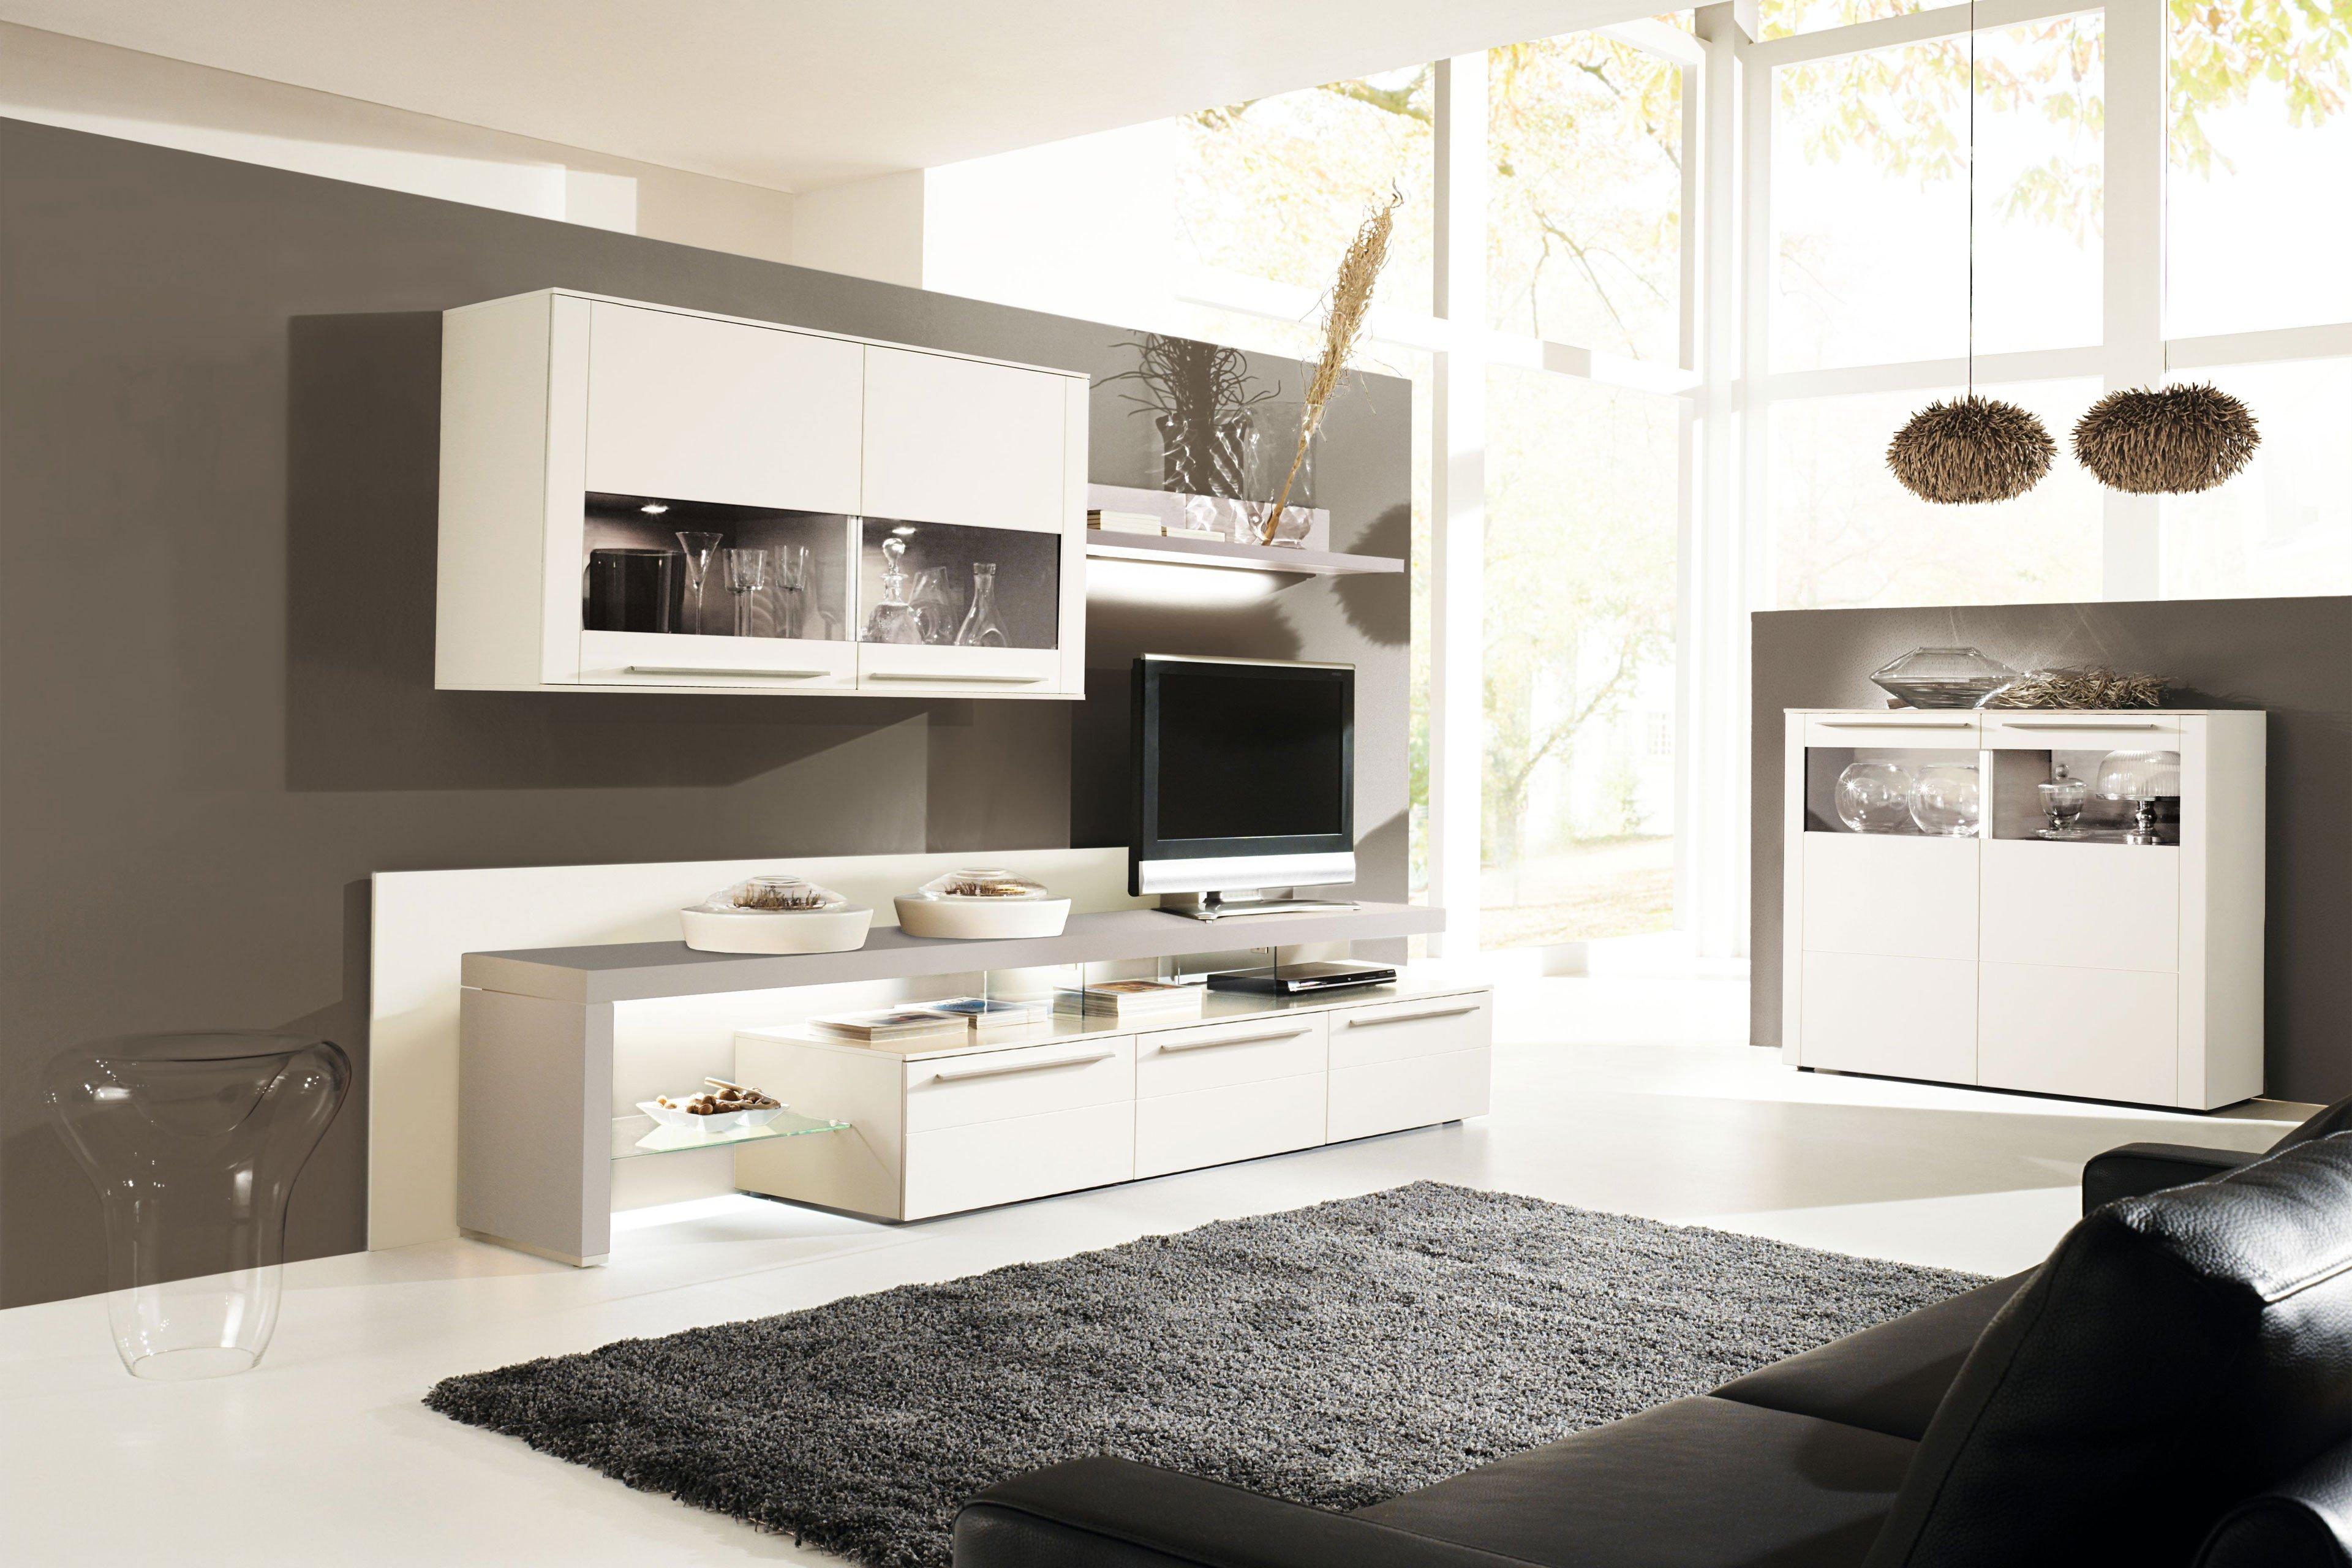 gwinner wohnwand bellano be29 wei kaschmir m bel letz. Black Bedroom Furniture Sets. Home Design Ideas